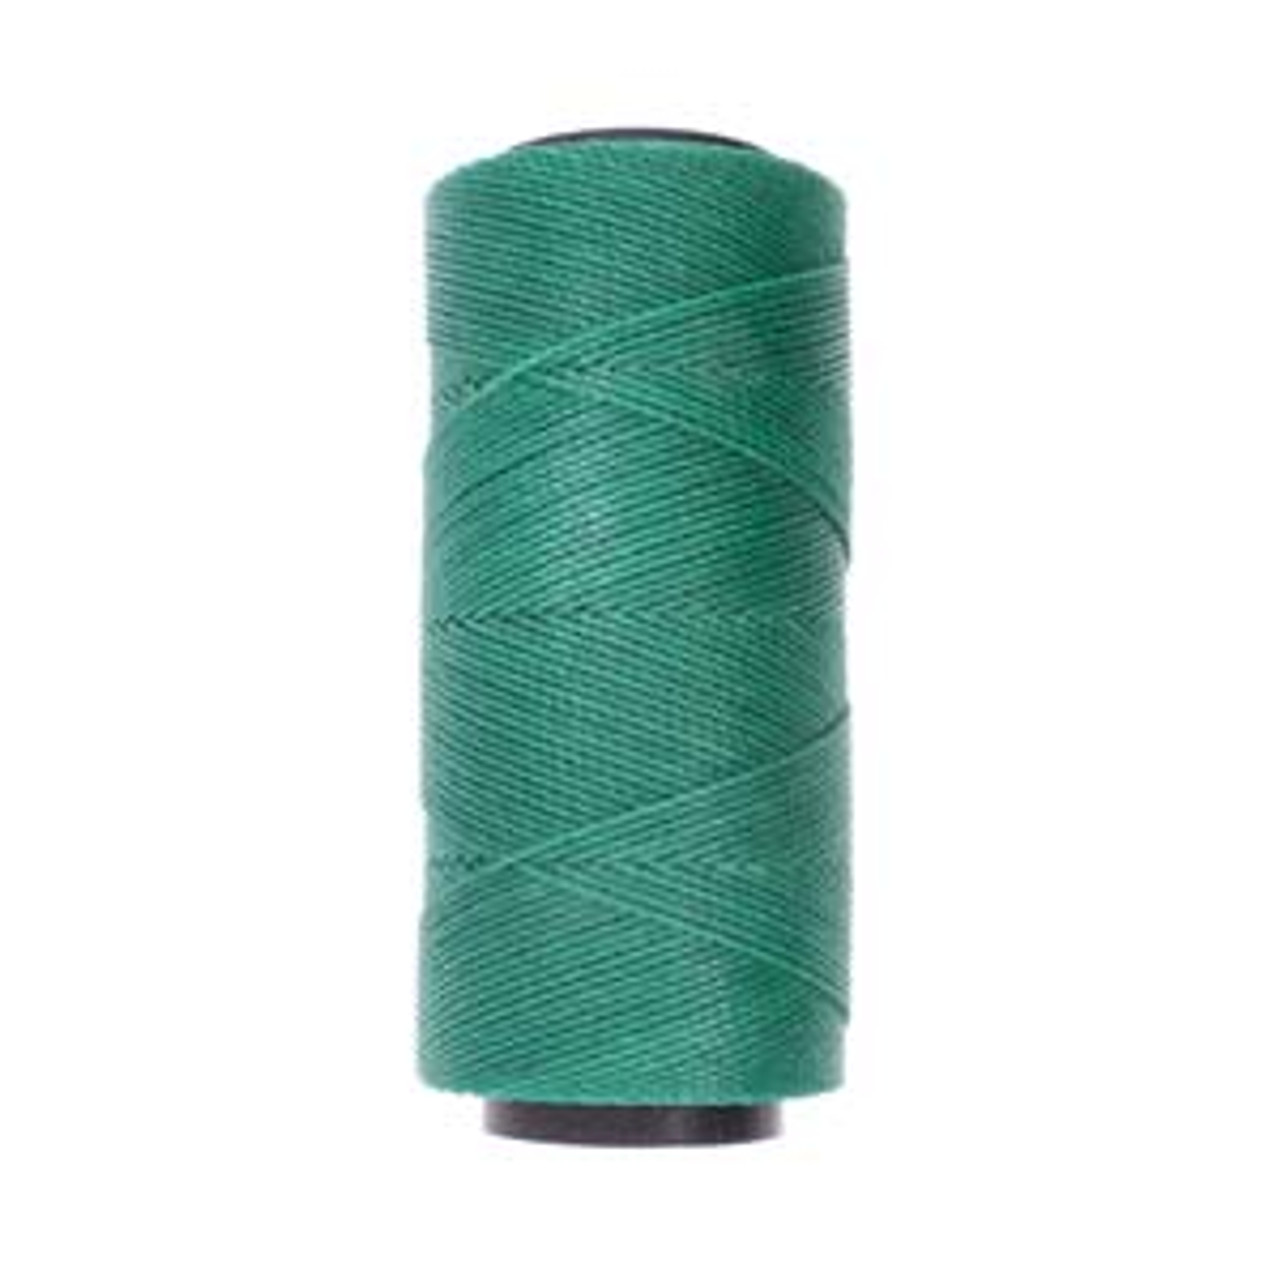 144yds 2 ply Evergreen Waxed Brazilian Cord